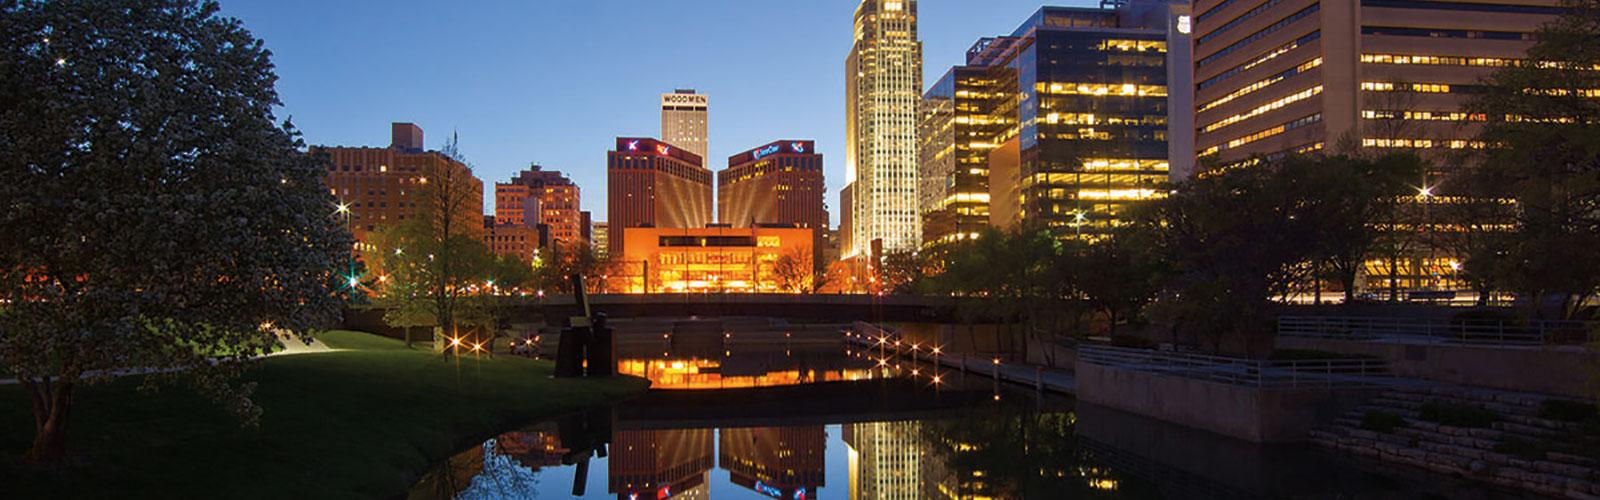 Omaha skyline at night